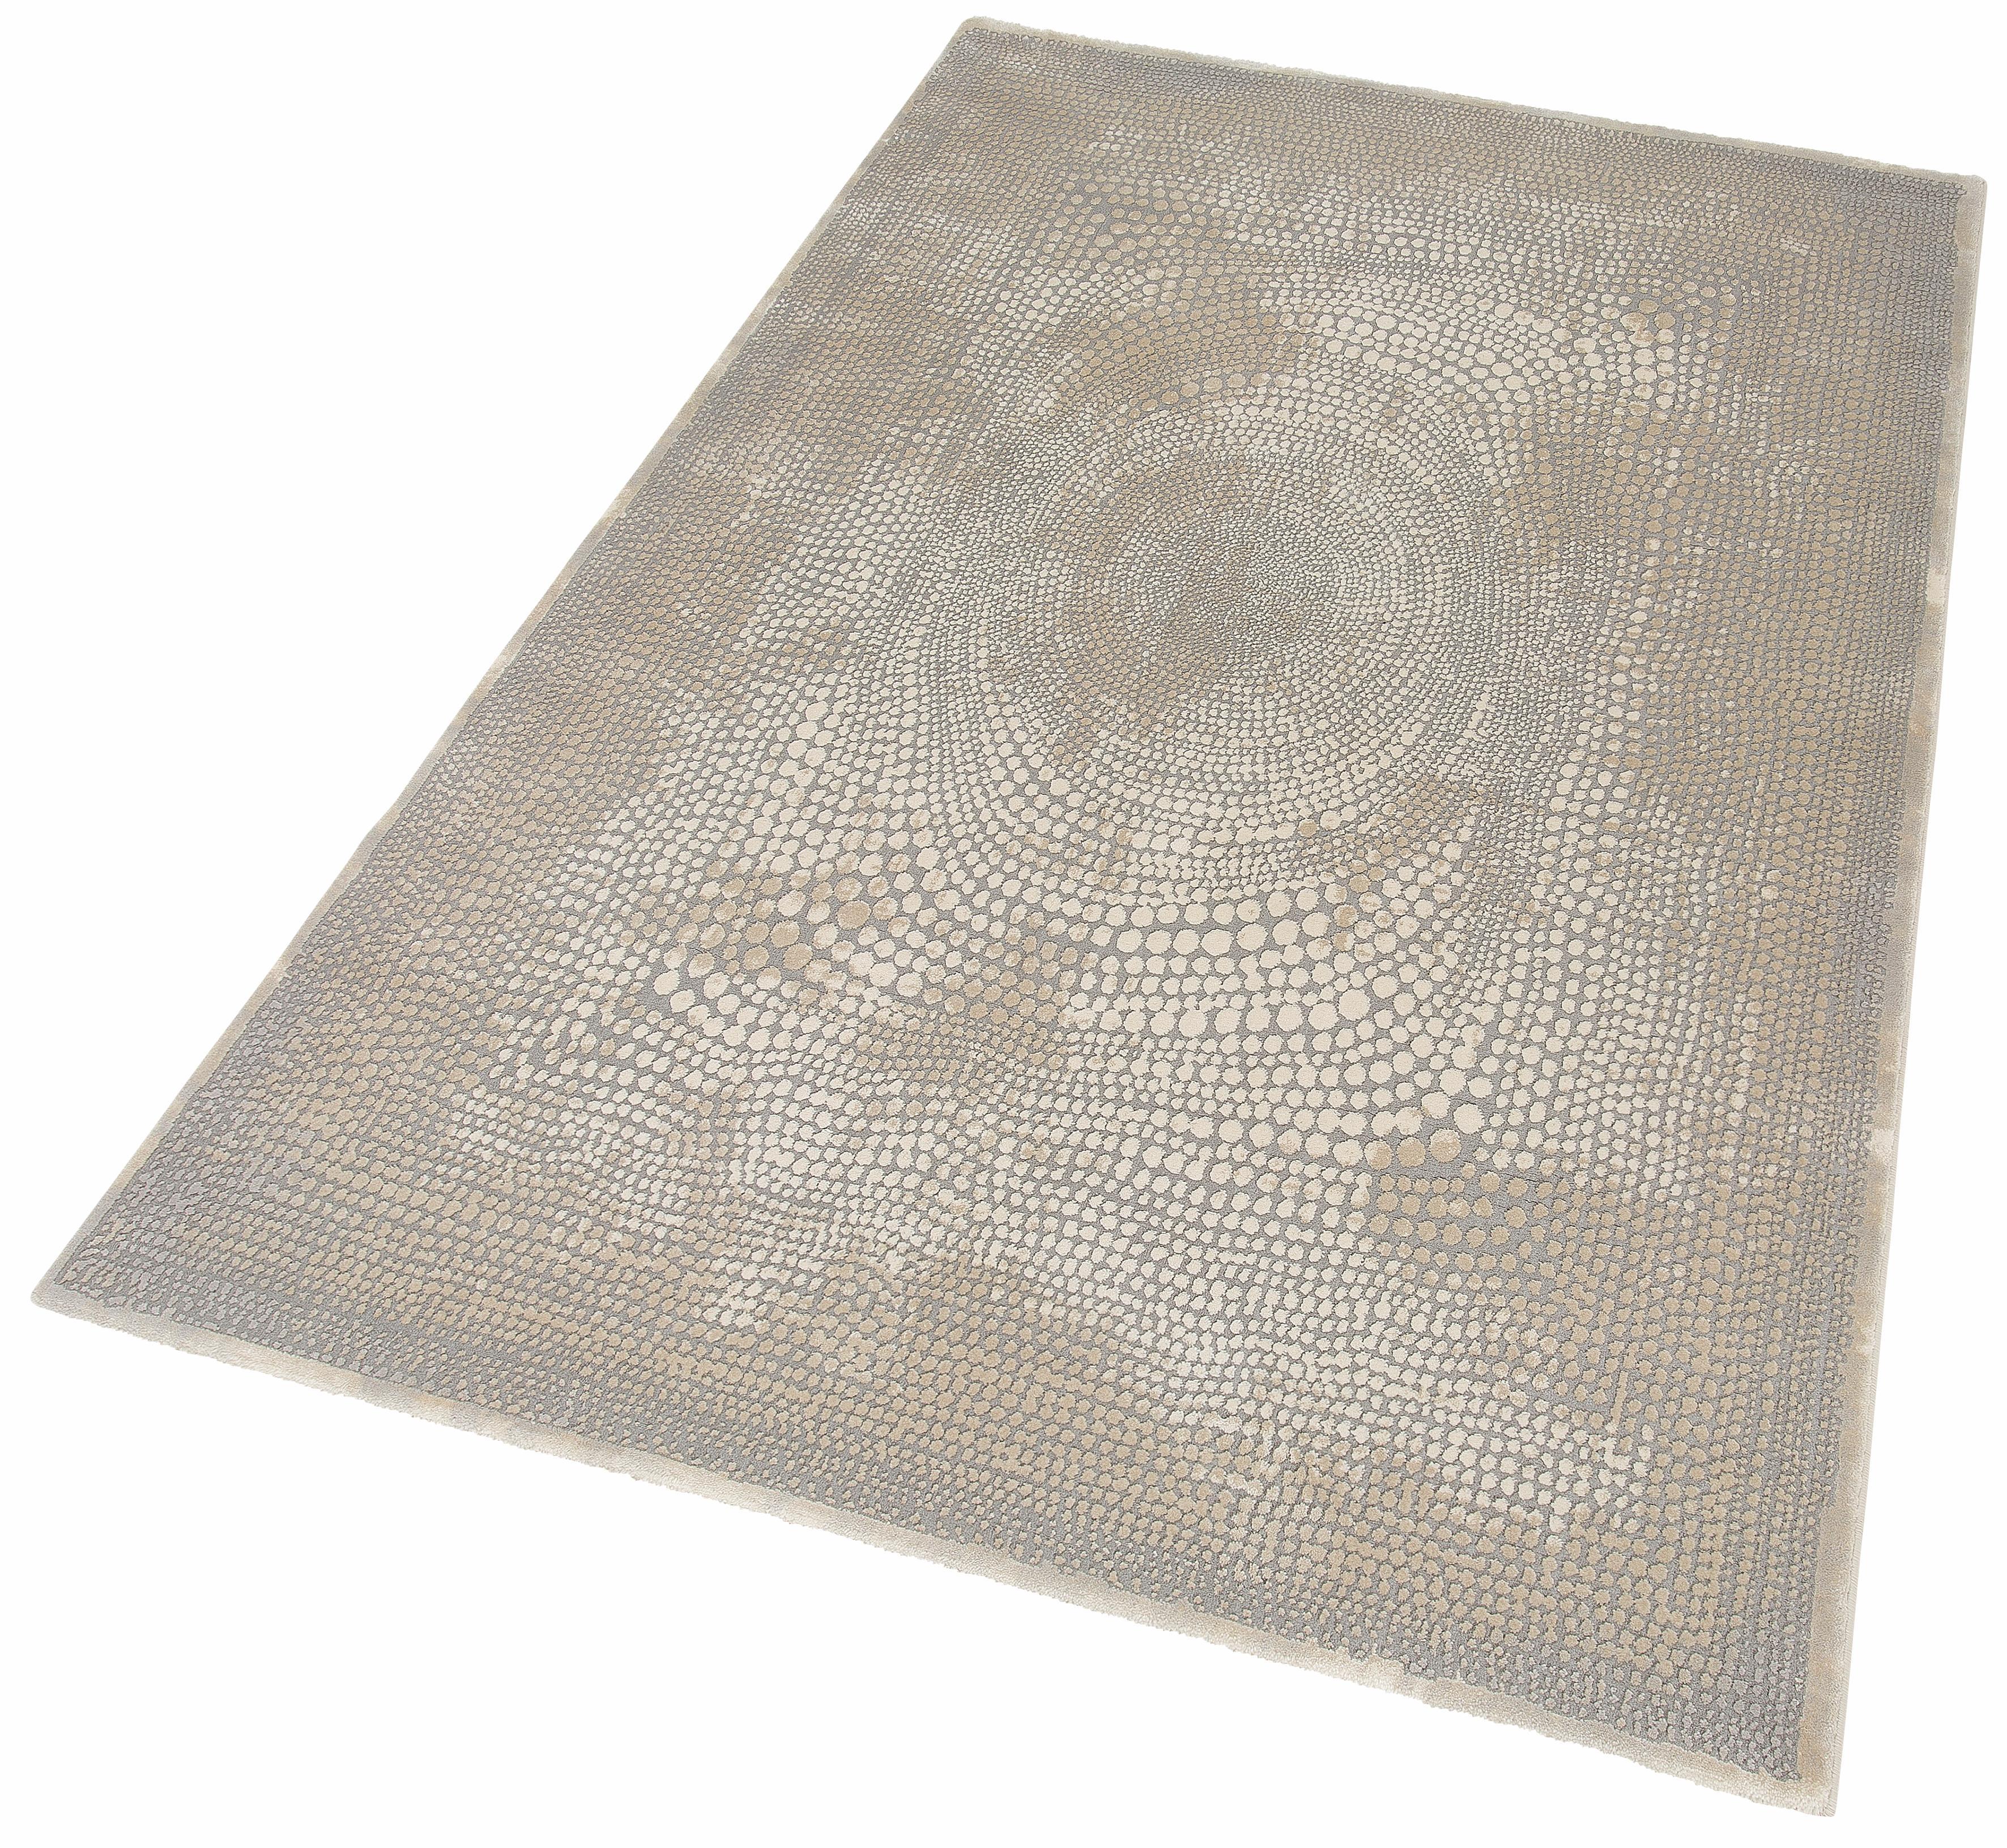 Teppich merinos Asos 17022 Höhe 12 mm gewebt